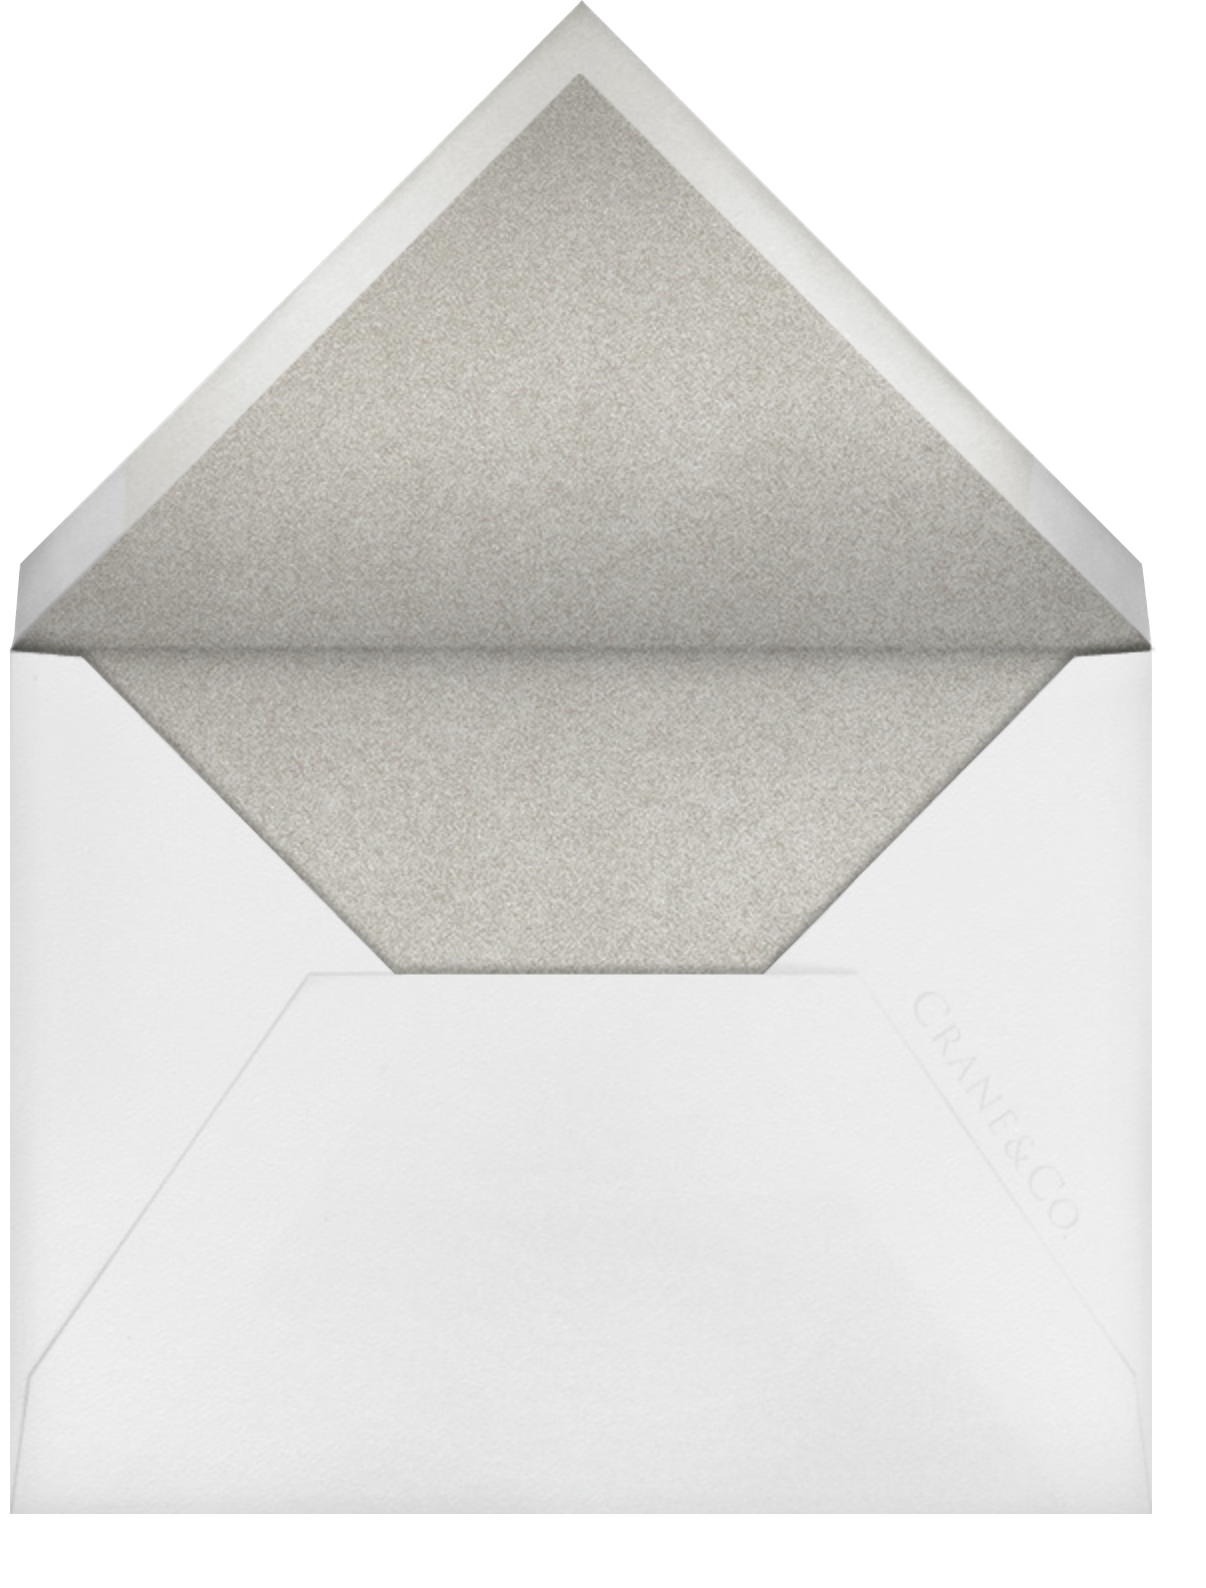 Whitby - Platinum - Paperless Post - All - envelope back